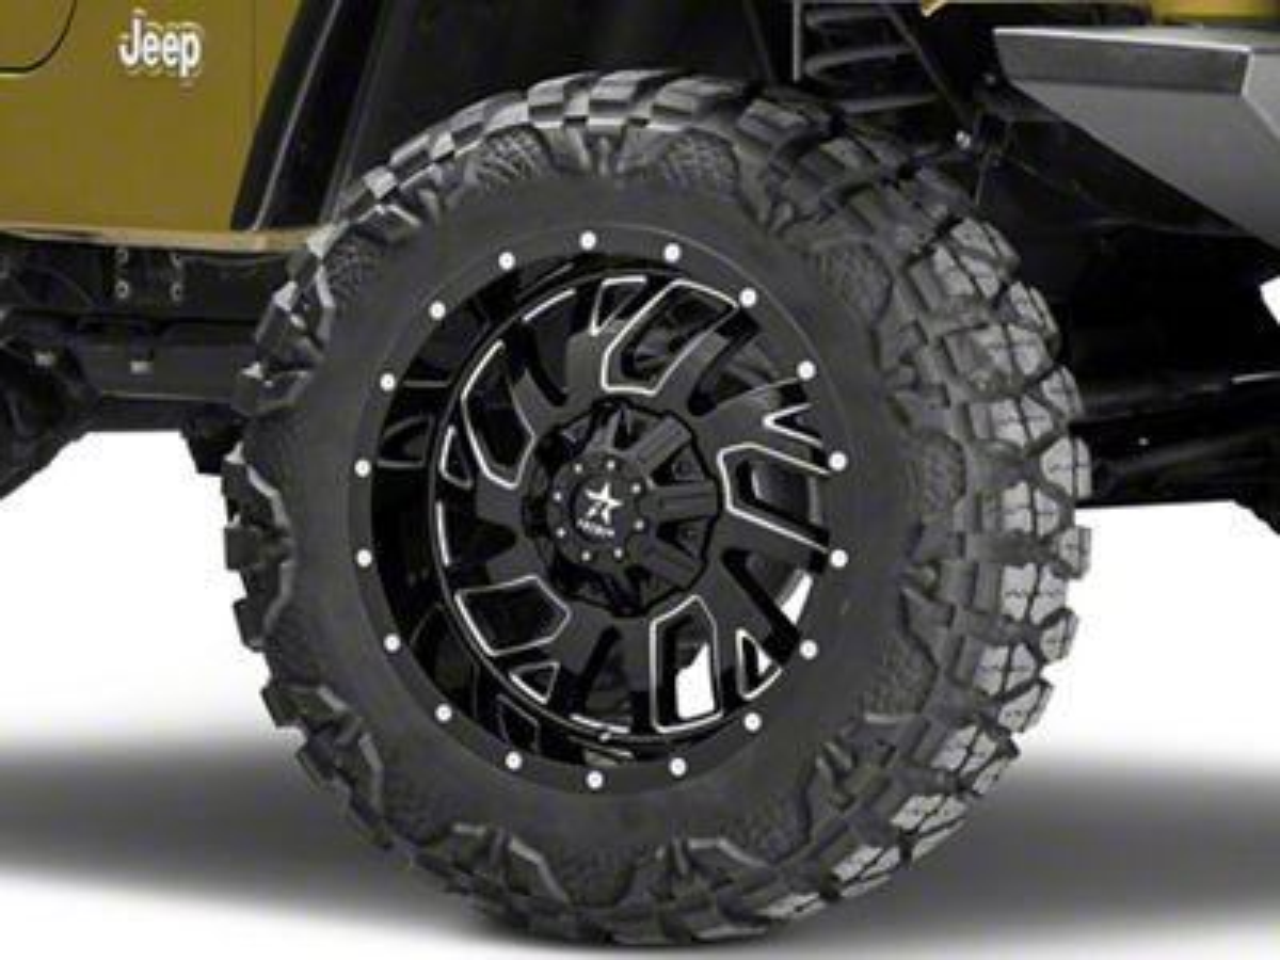 RBP 65R Glock Gloss Black w/ Machined Grooves Wheel - 20x10 (87-06 Jeep Wrangler YJ & TJ)